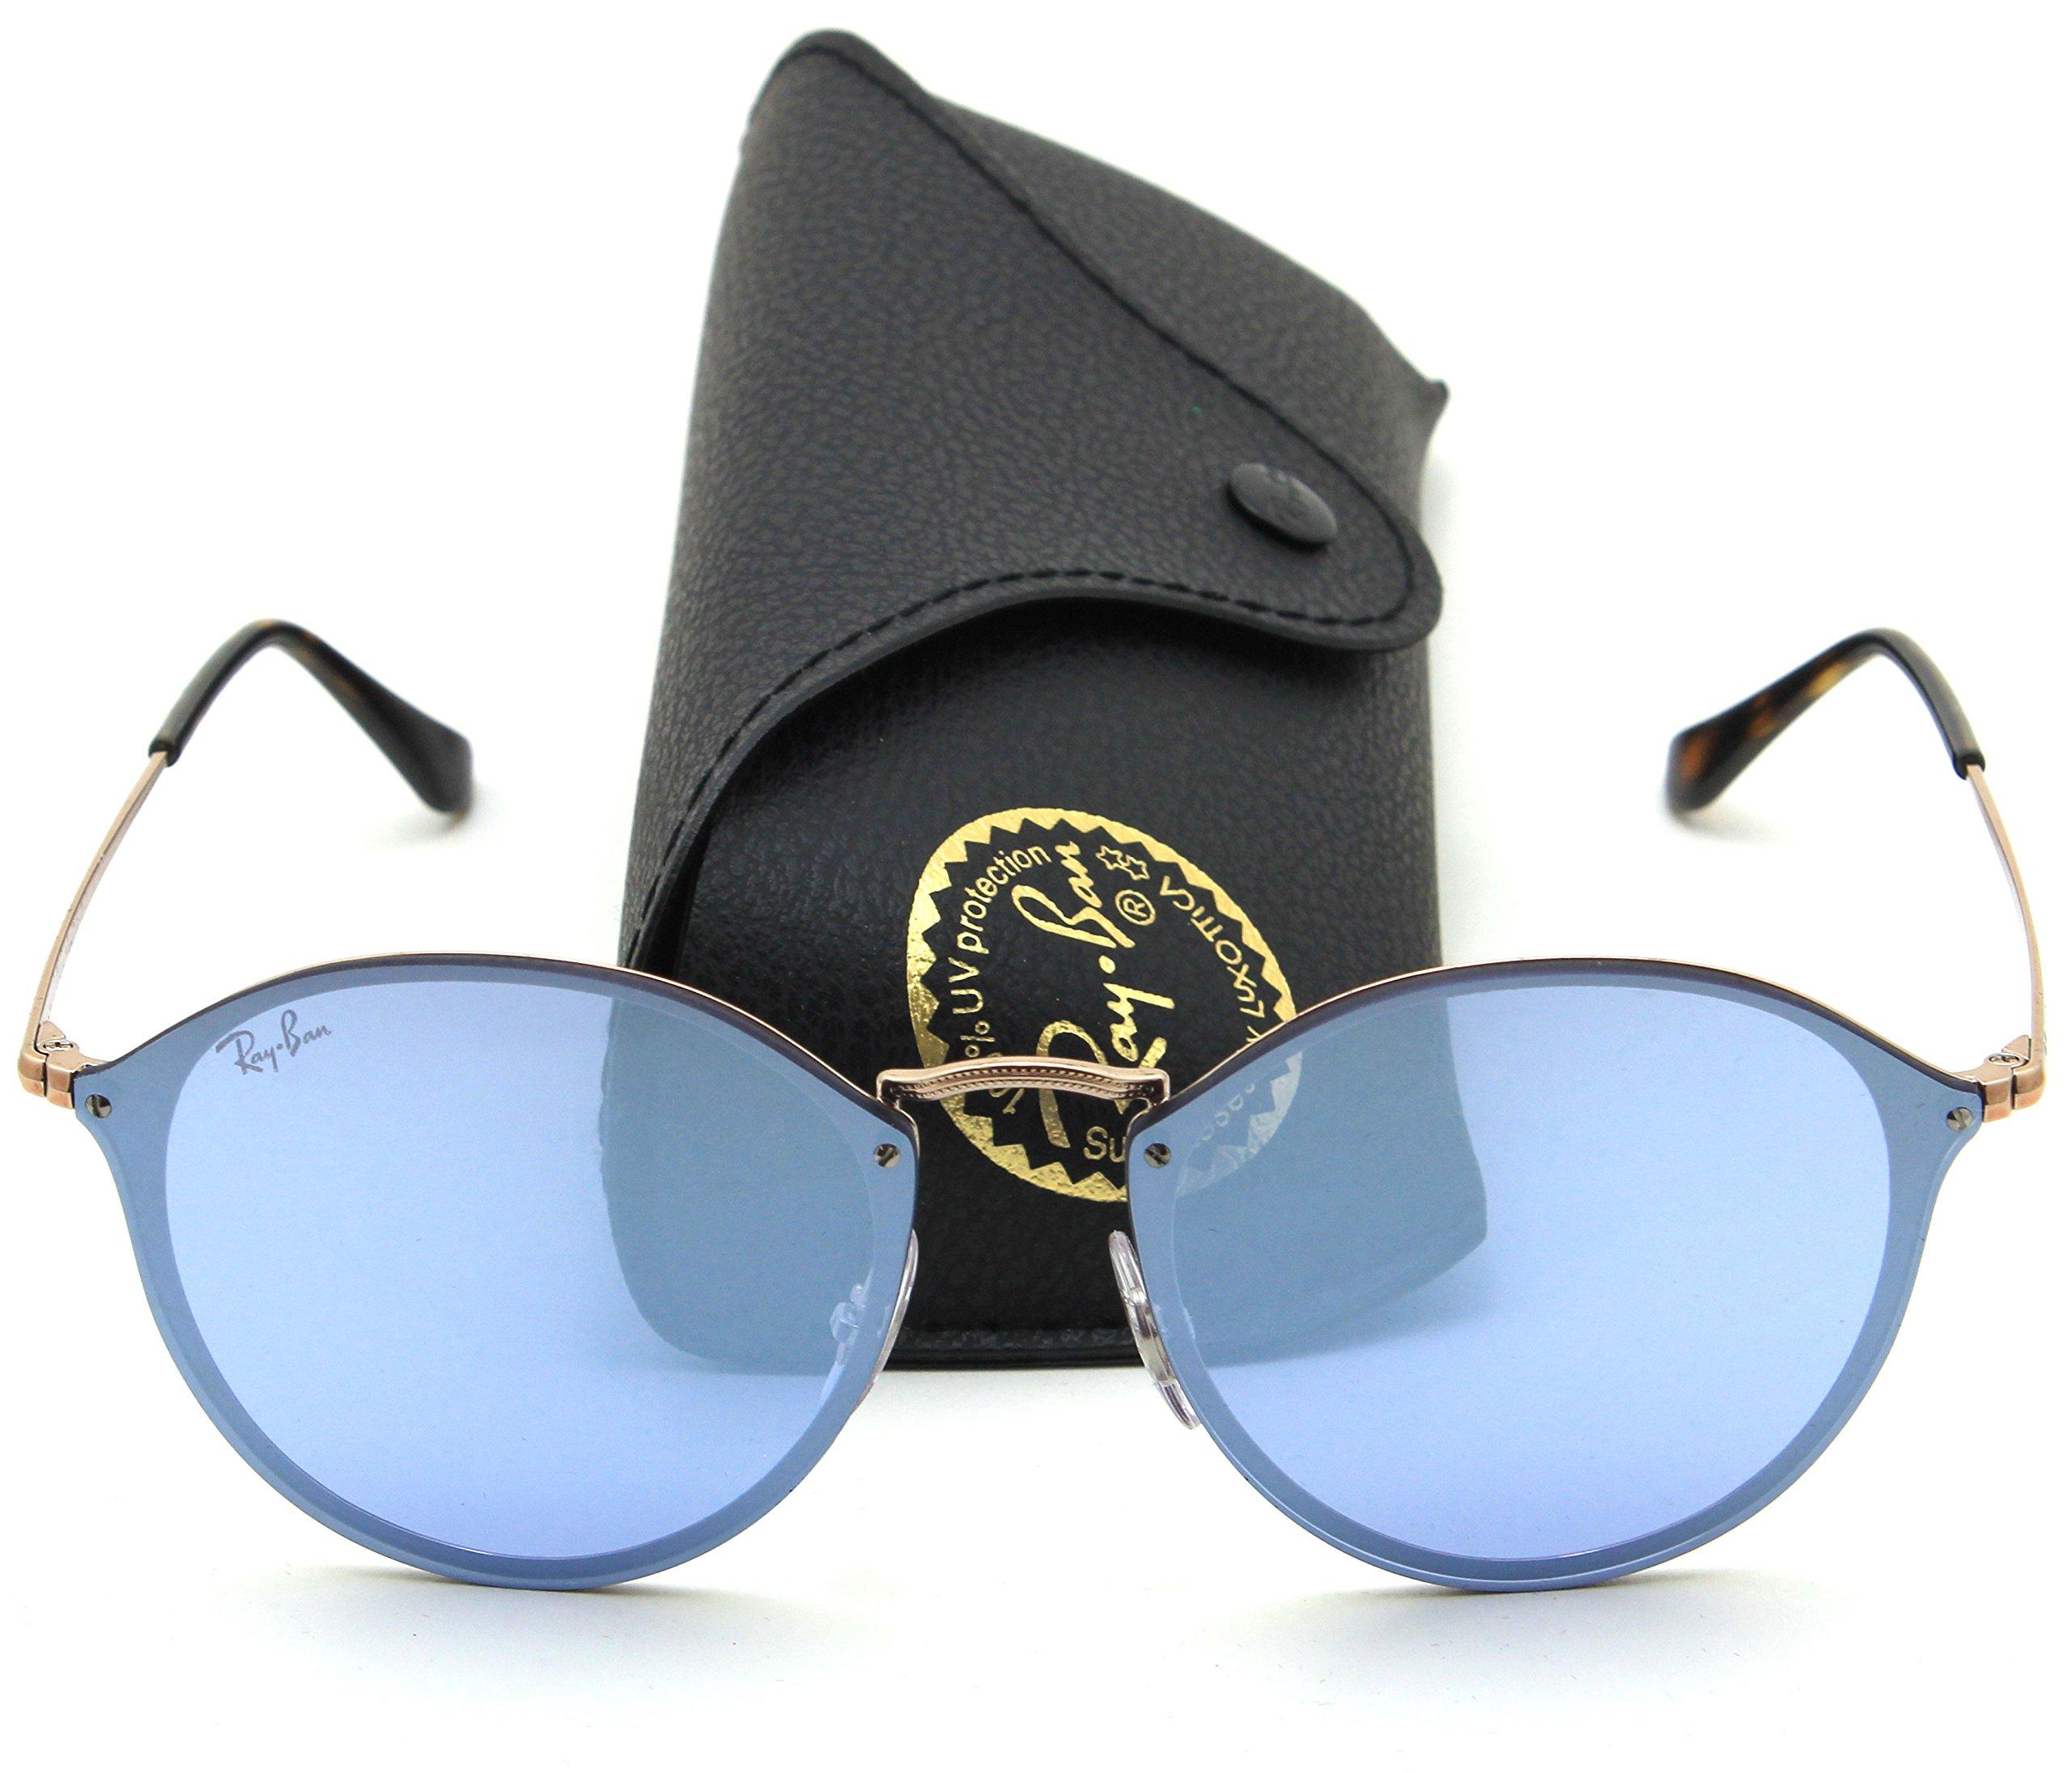 Ray-Ban RB3574N BLAZE ROUND Mirror Sunglasses 90351U, 59mm